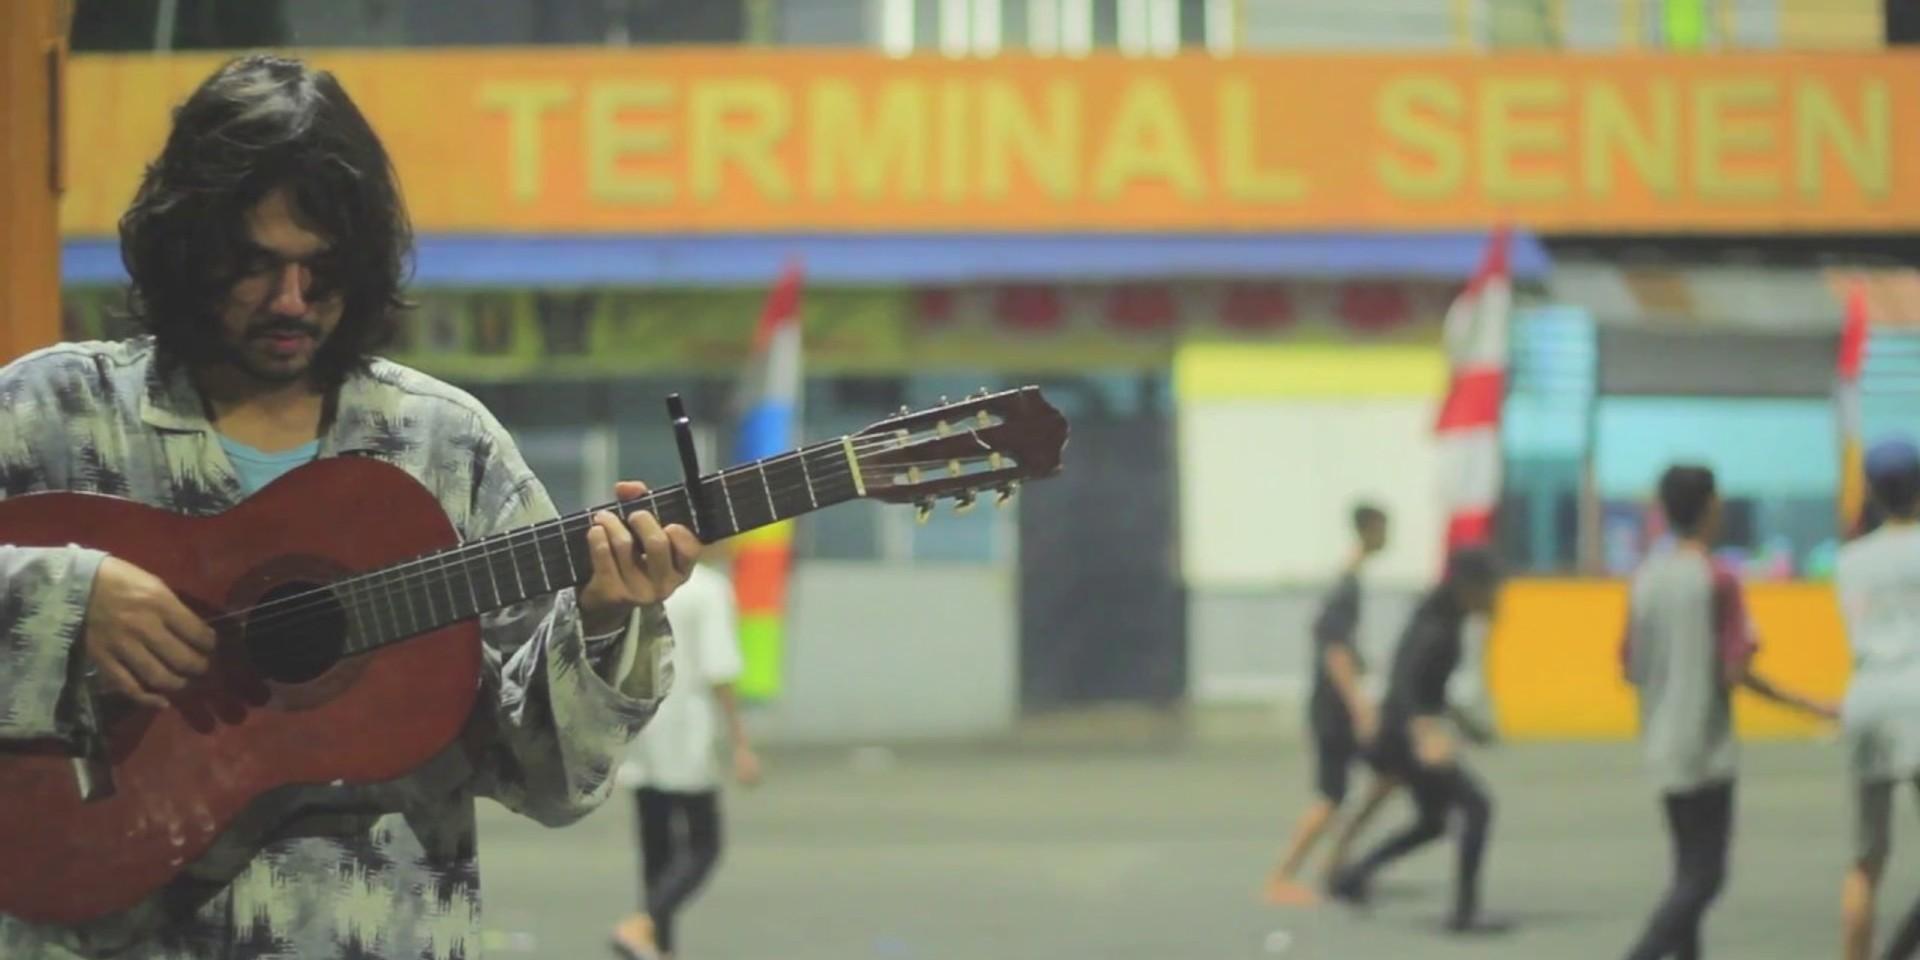 Jason Ranti releases latest music video 'Suci Maksimal' — watch